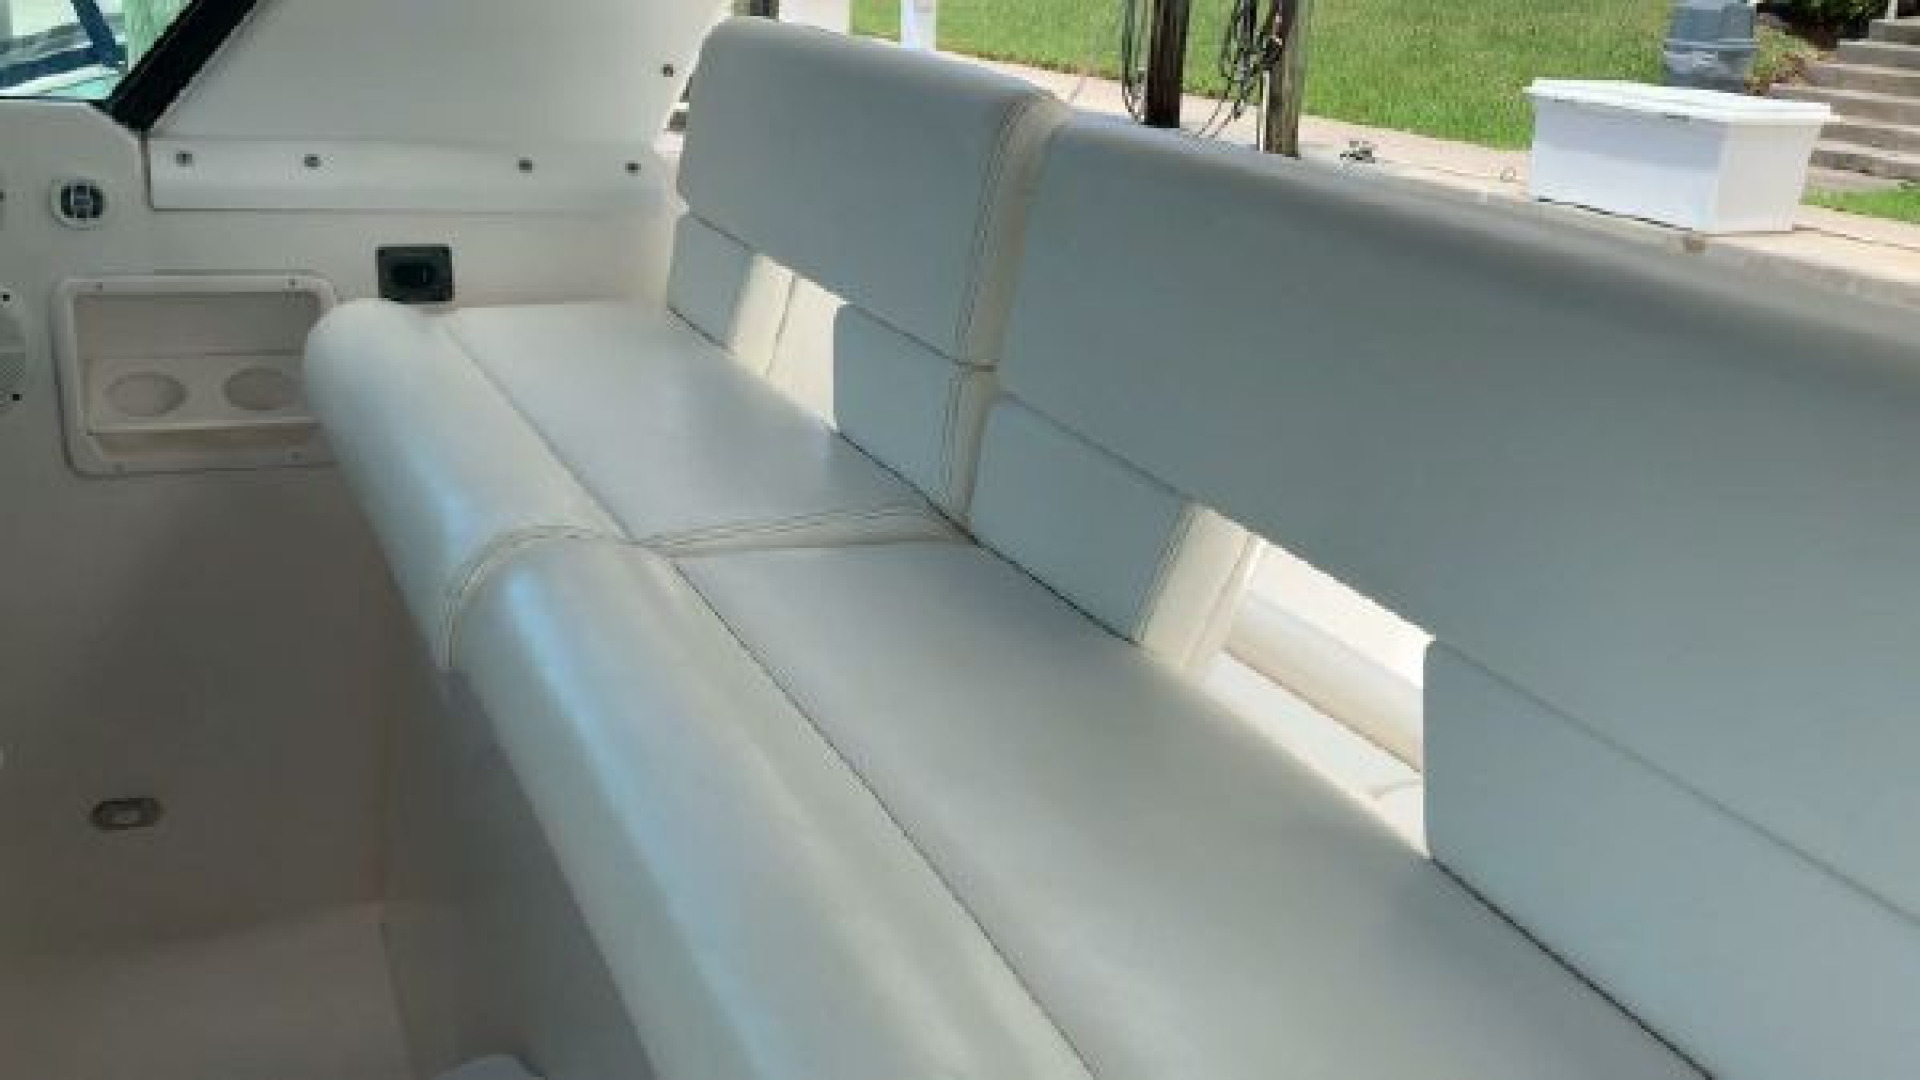 Tiara Yachts-4000 Express Cummins Engines 2001 -Boca Raton-Florida-United States-1564183   Thumbnail